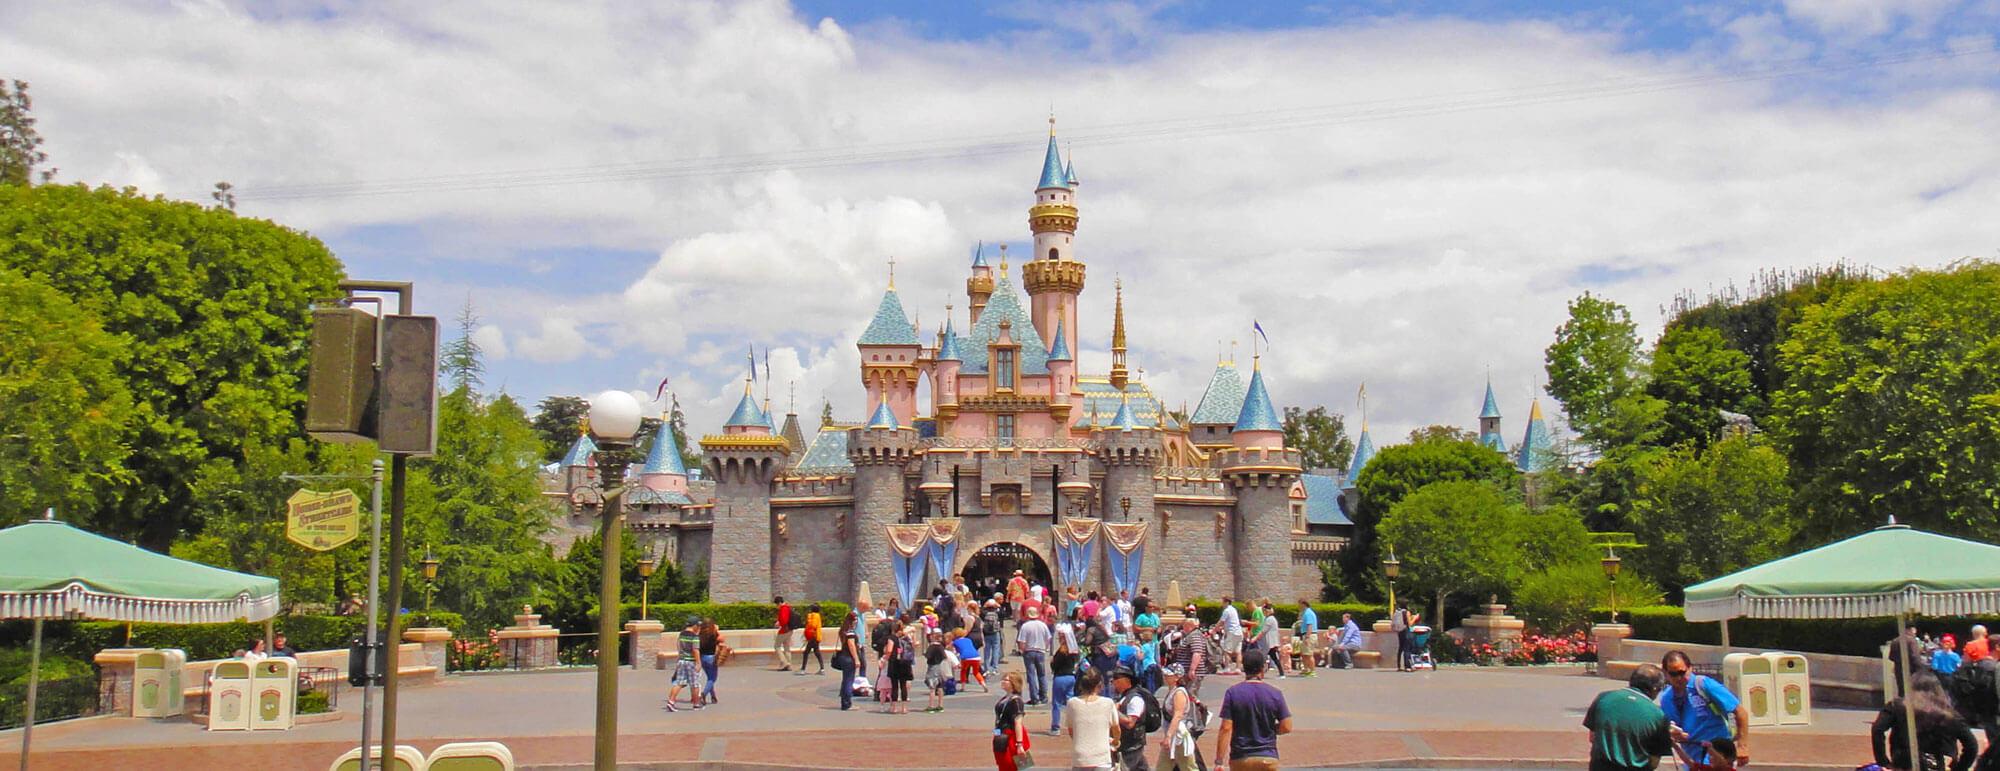 Top Disney posts 2014 - Sleeping Beauty Castle